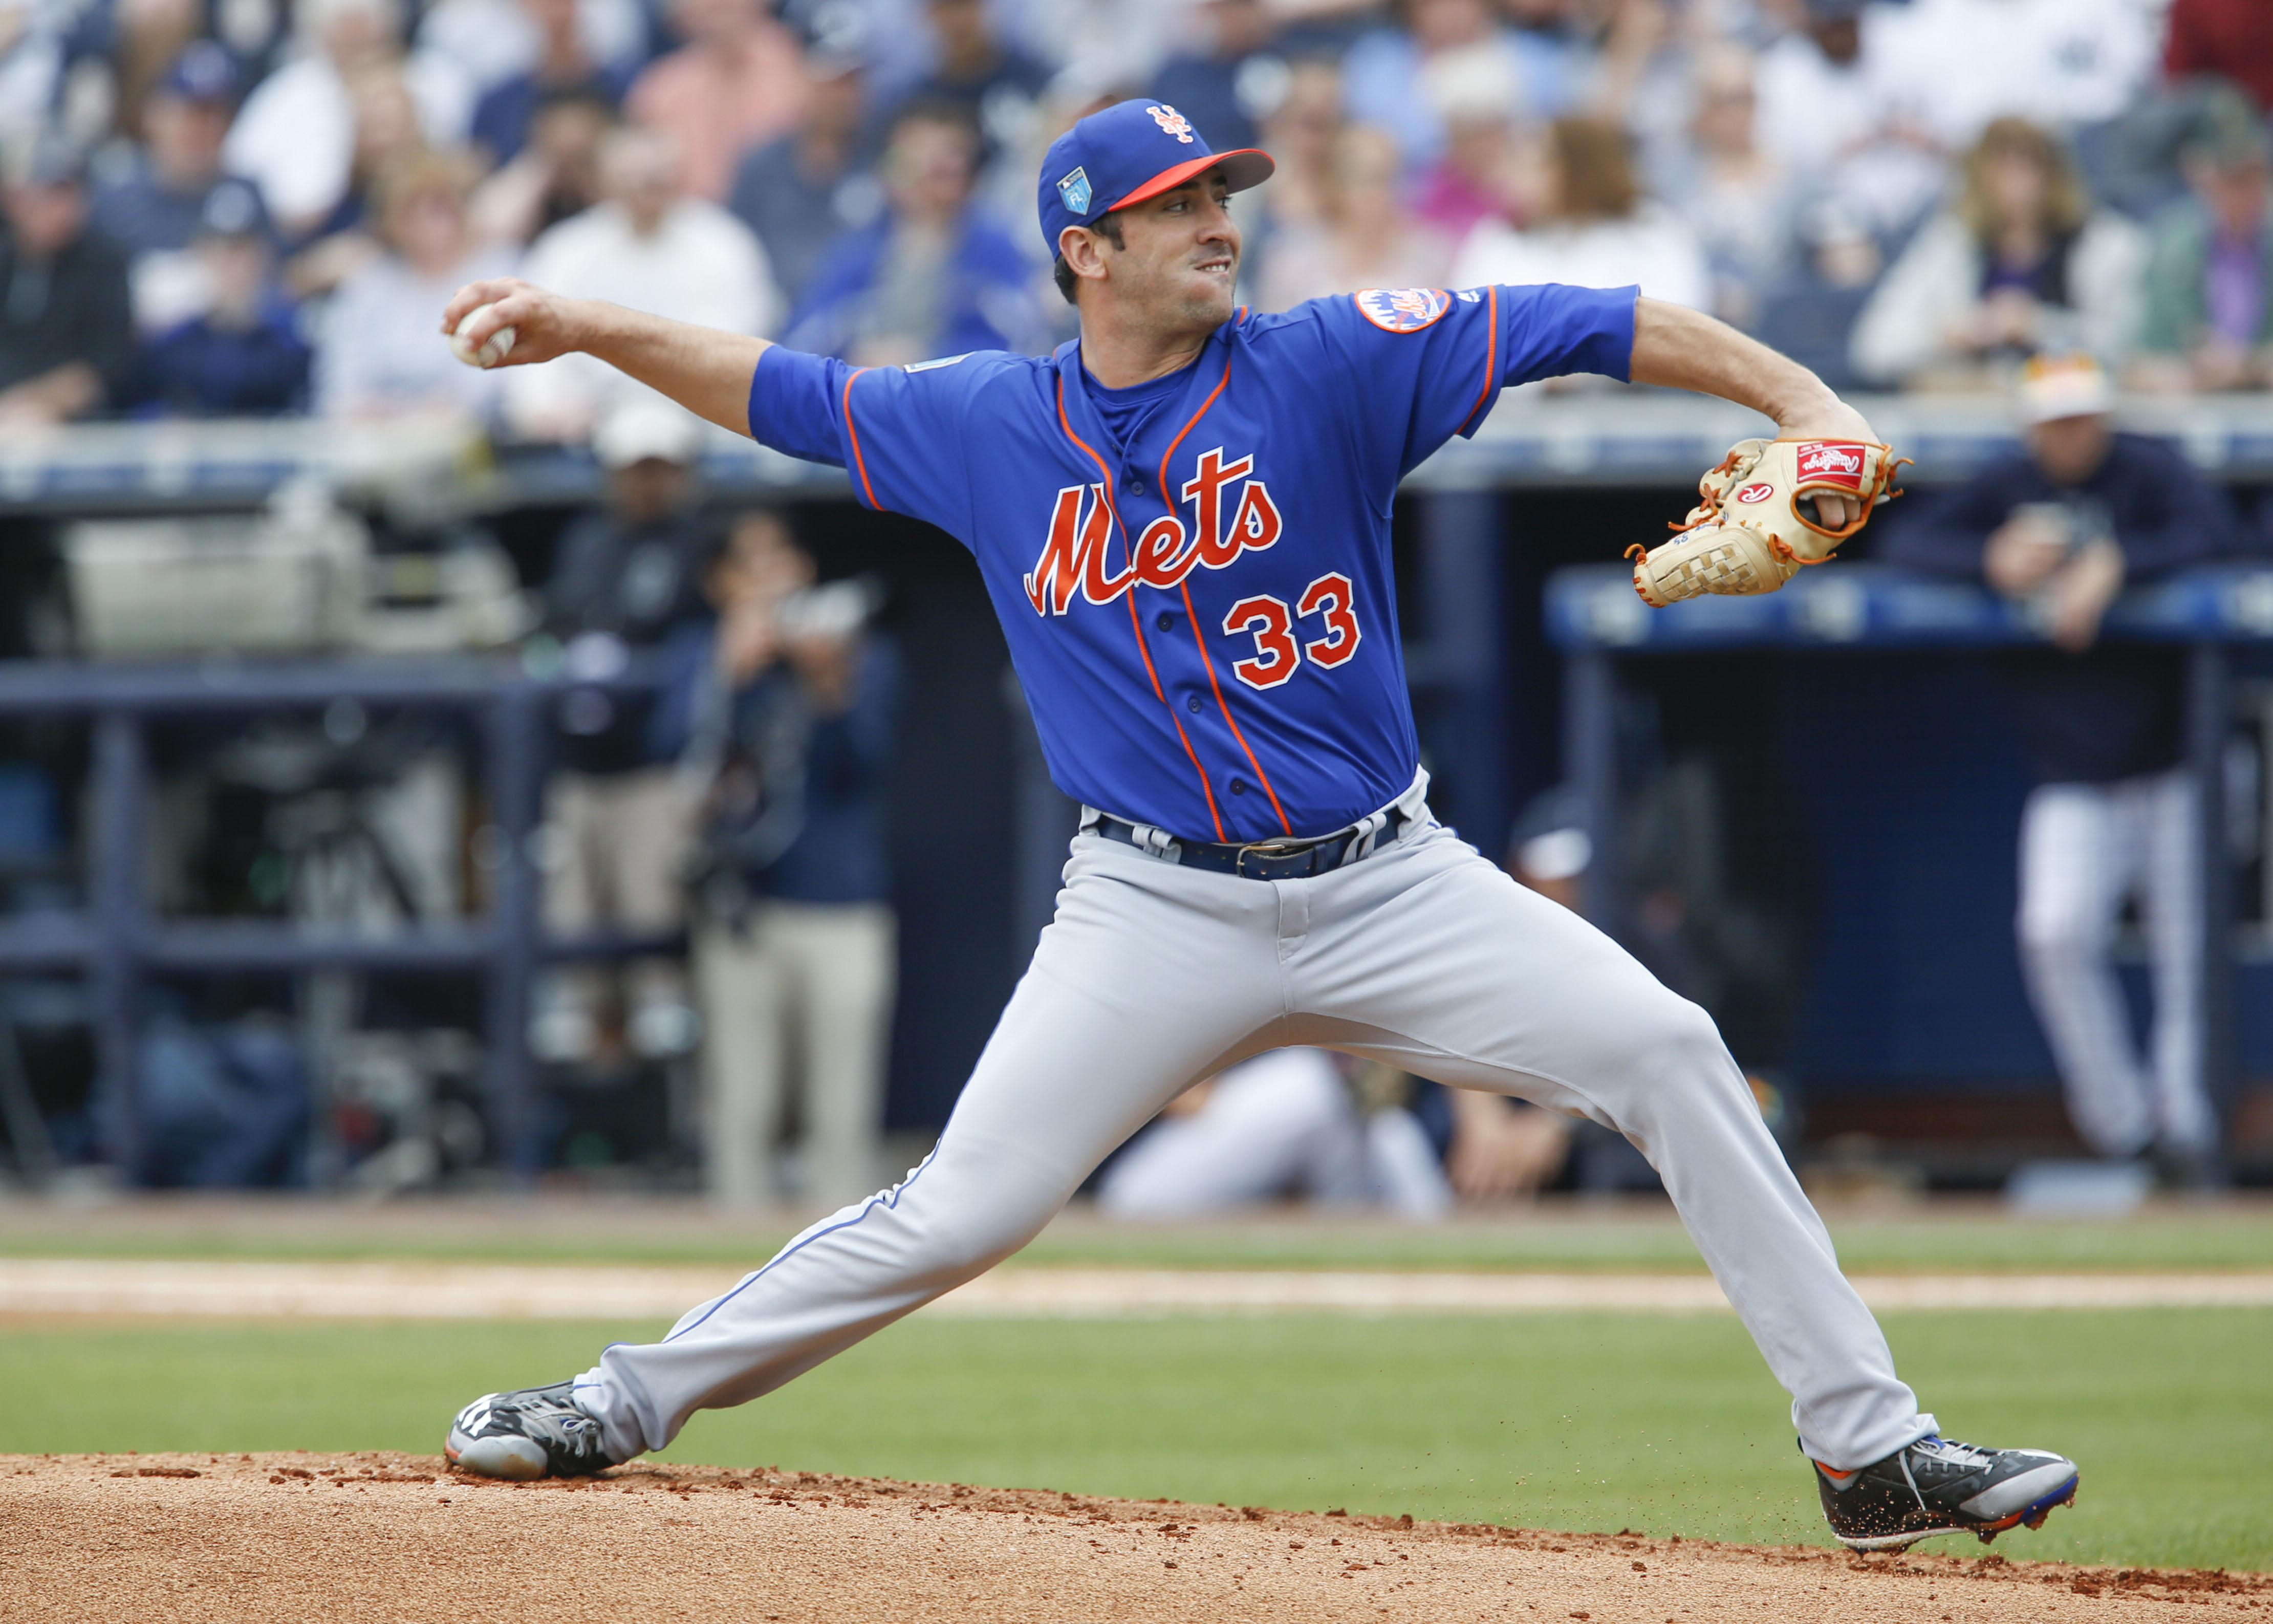 Matt Harvey Looks Shakier As Mets Fall To Yankees In Tampa